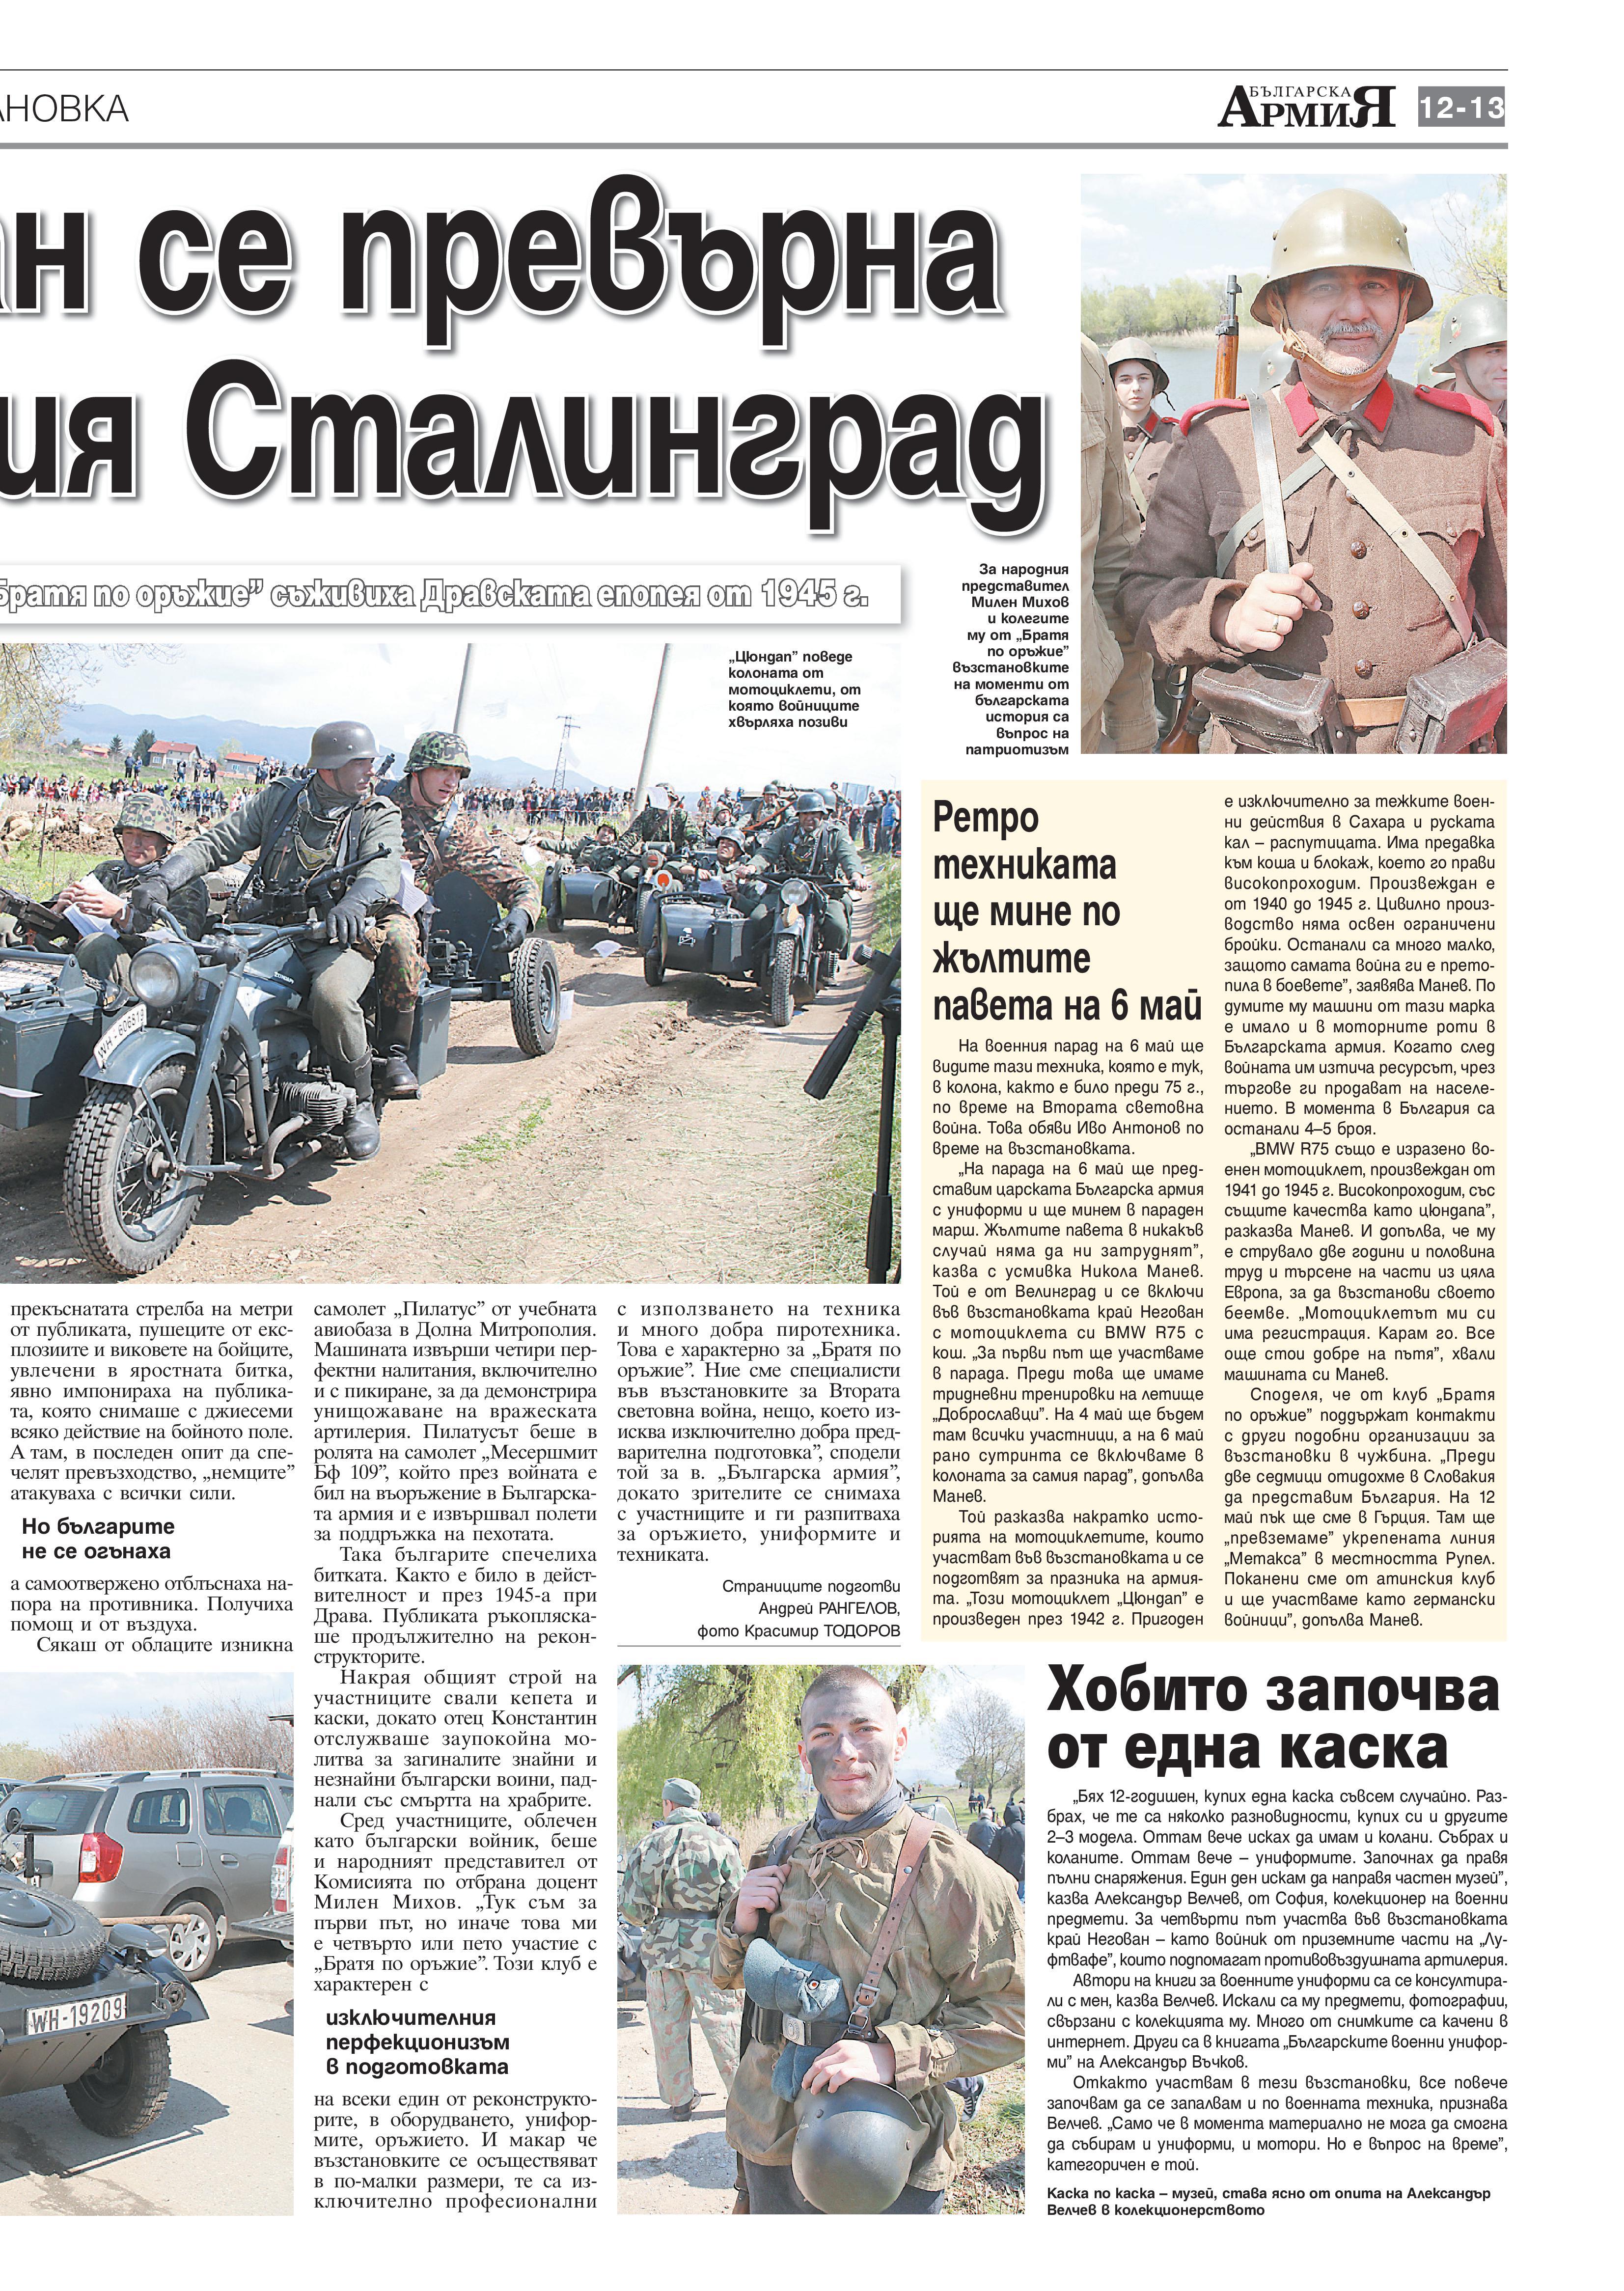 https://www.armymedia.bg/wp-content/uploads/2015/06/13-28.jpg